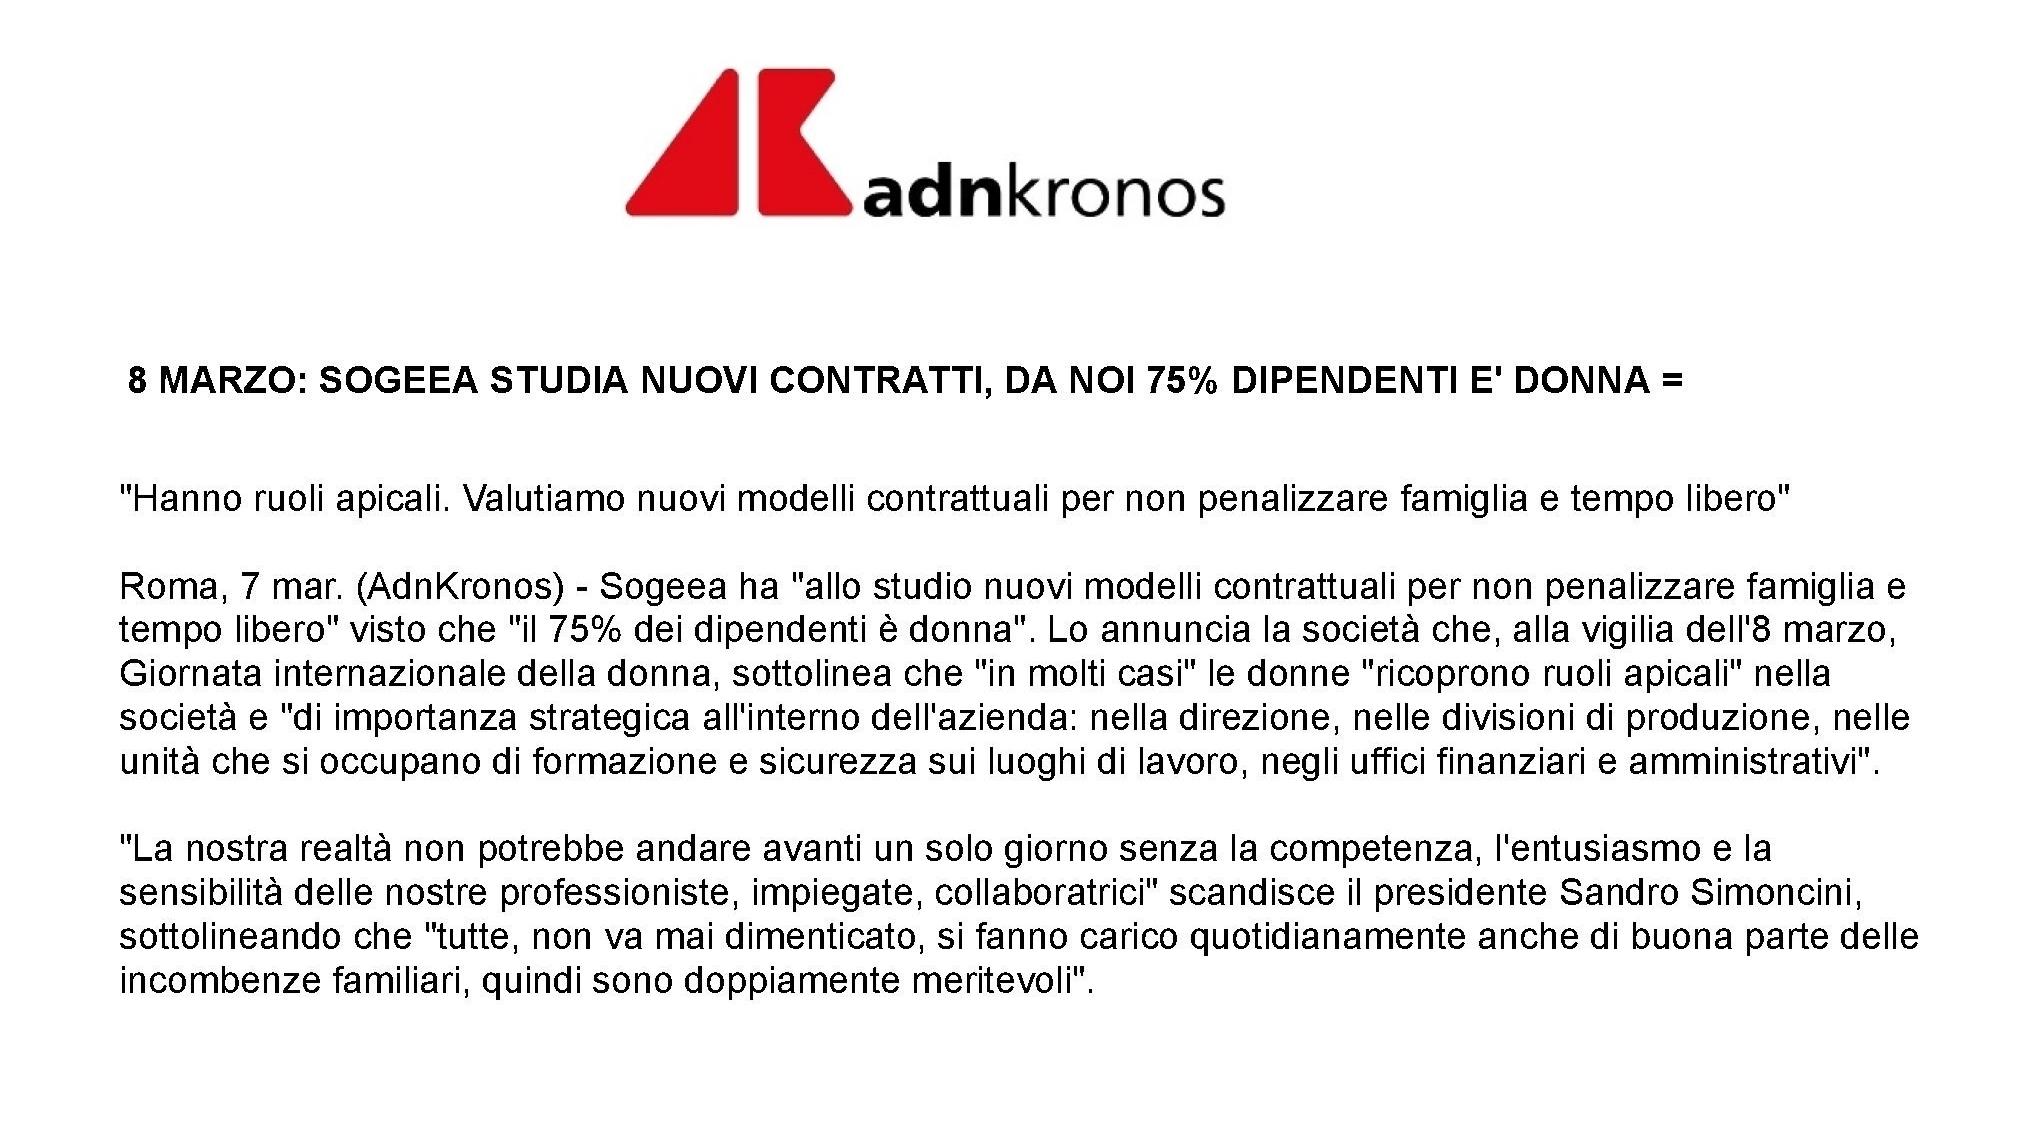 08.03 AdnKronos